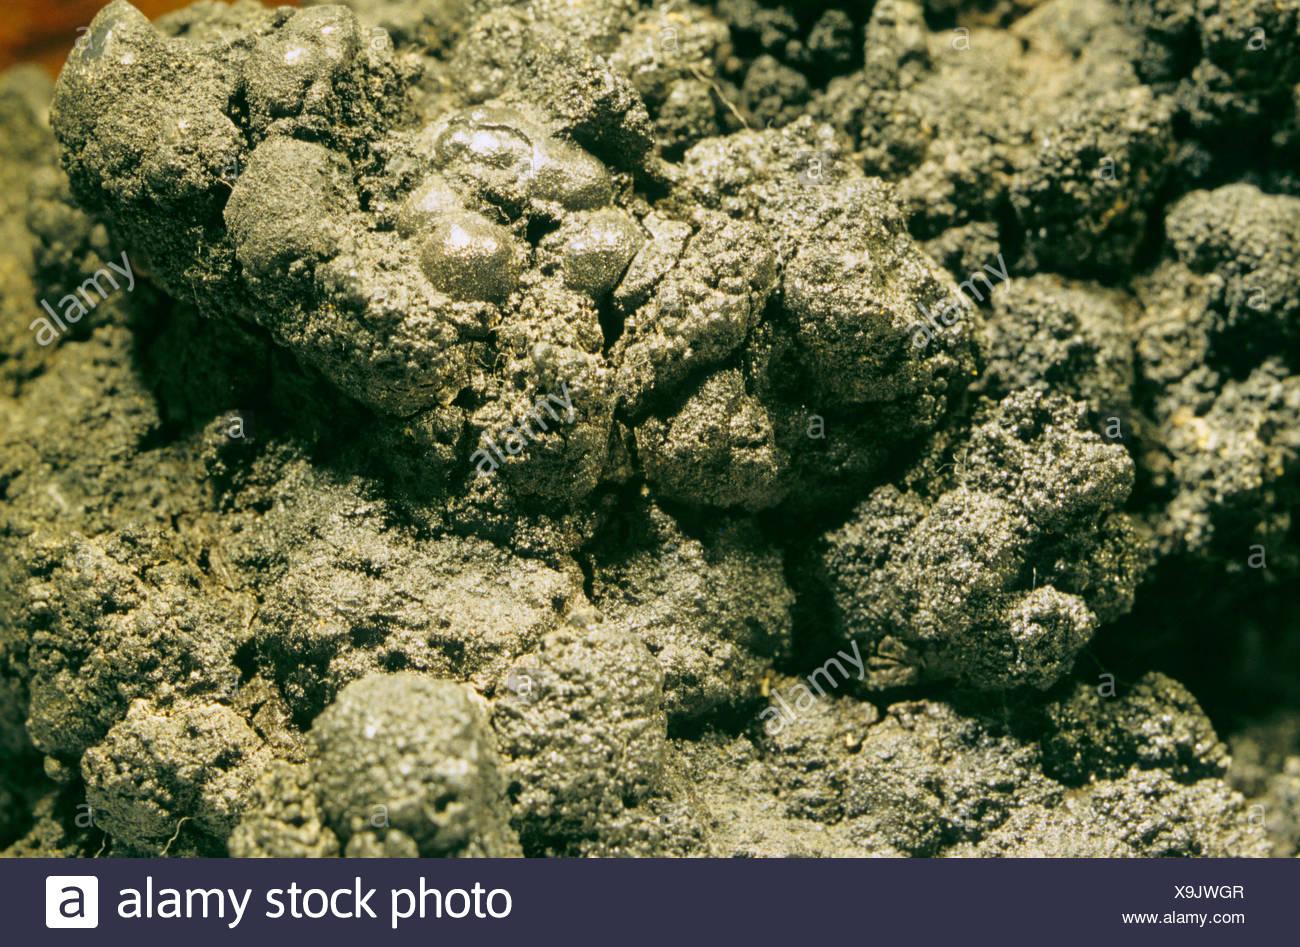 manganese nodules from deep-sea - Stock Image